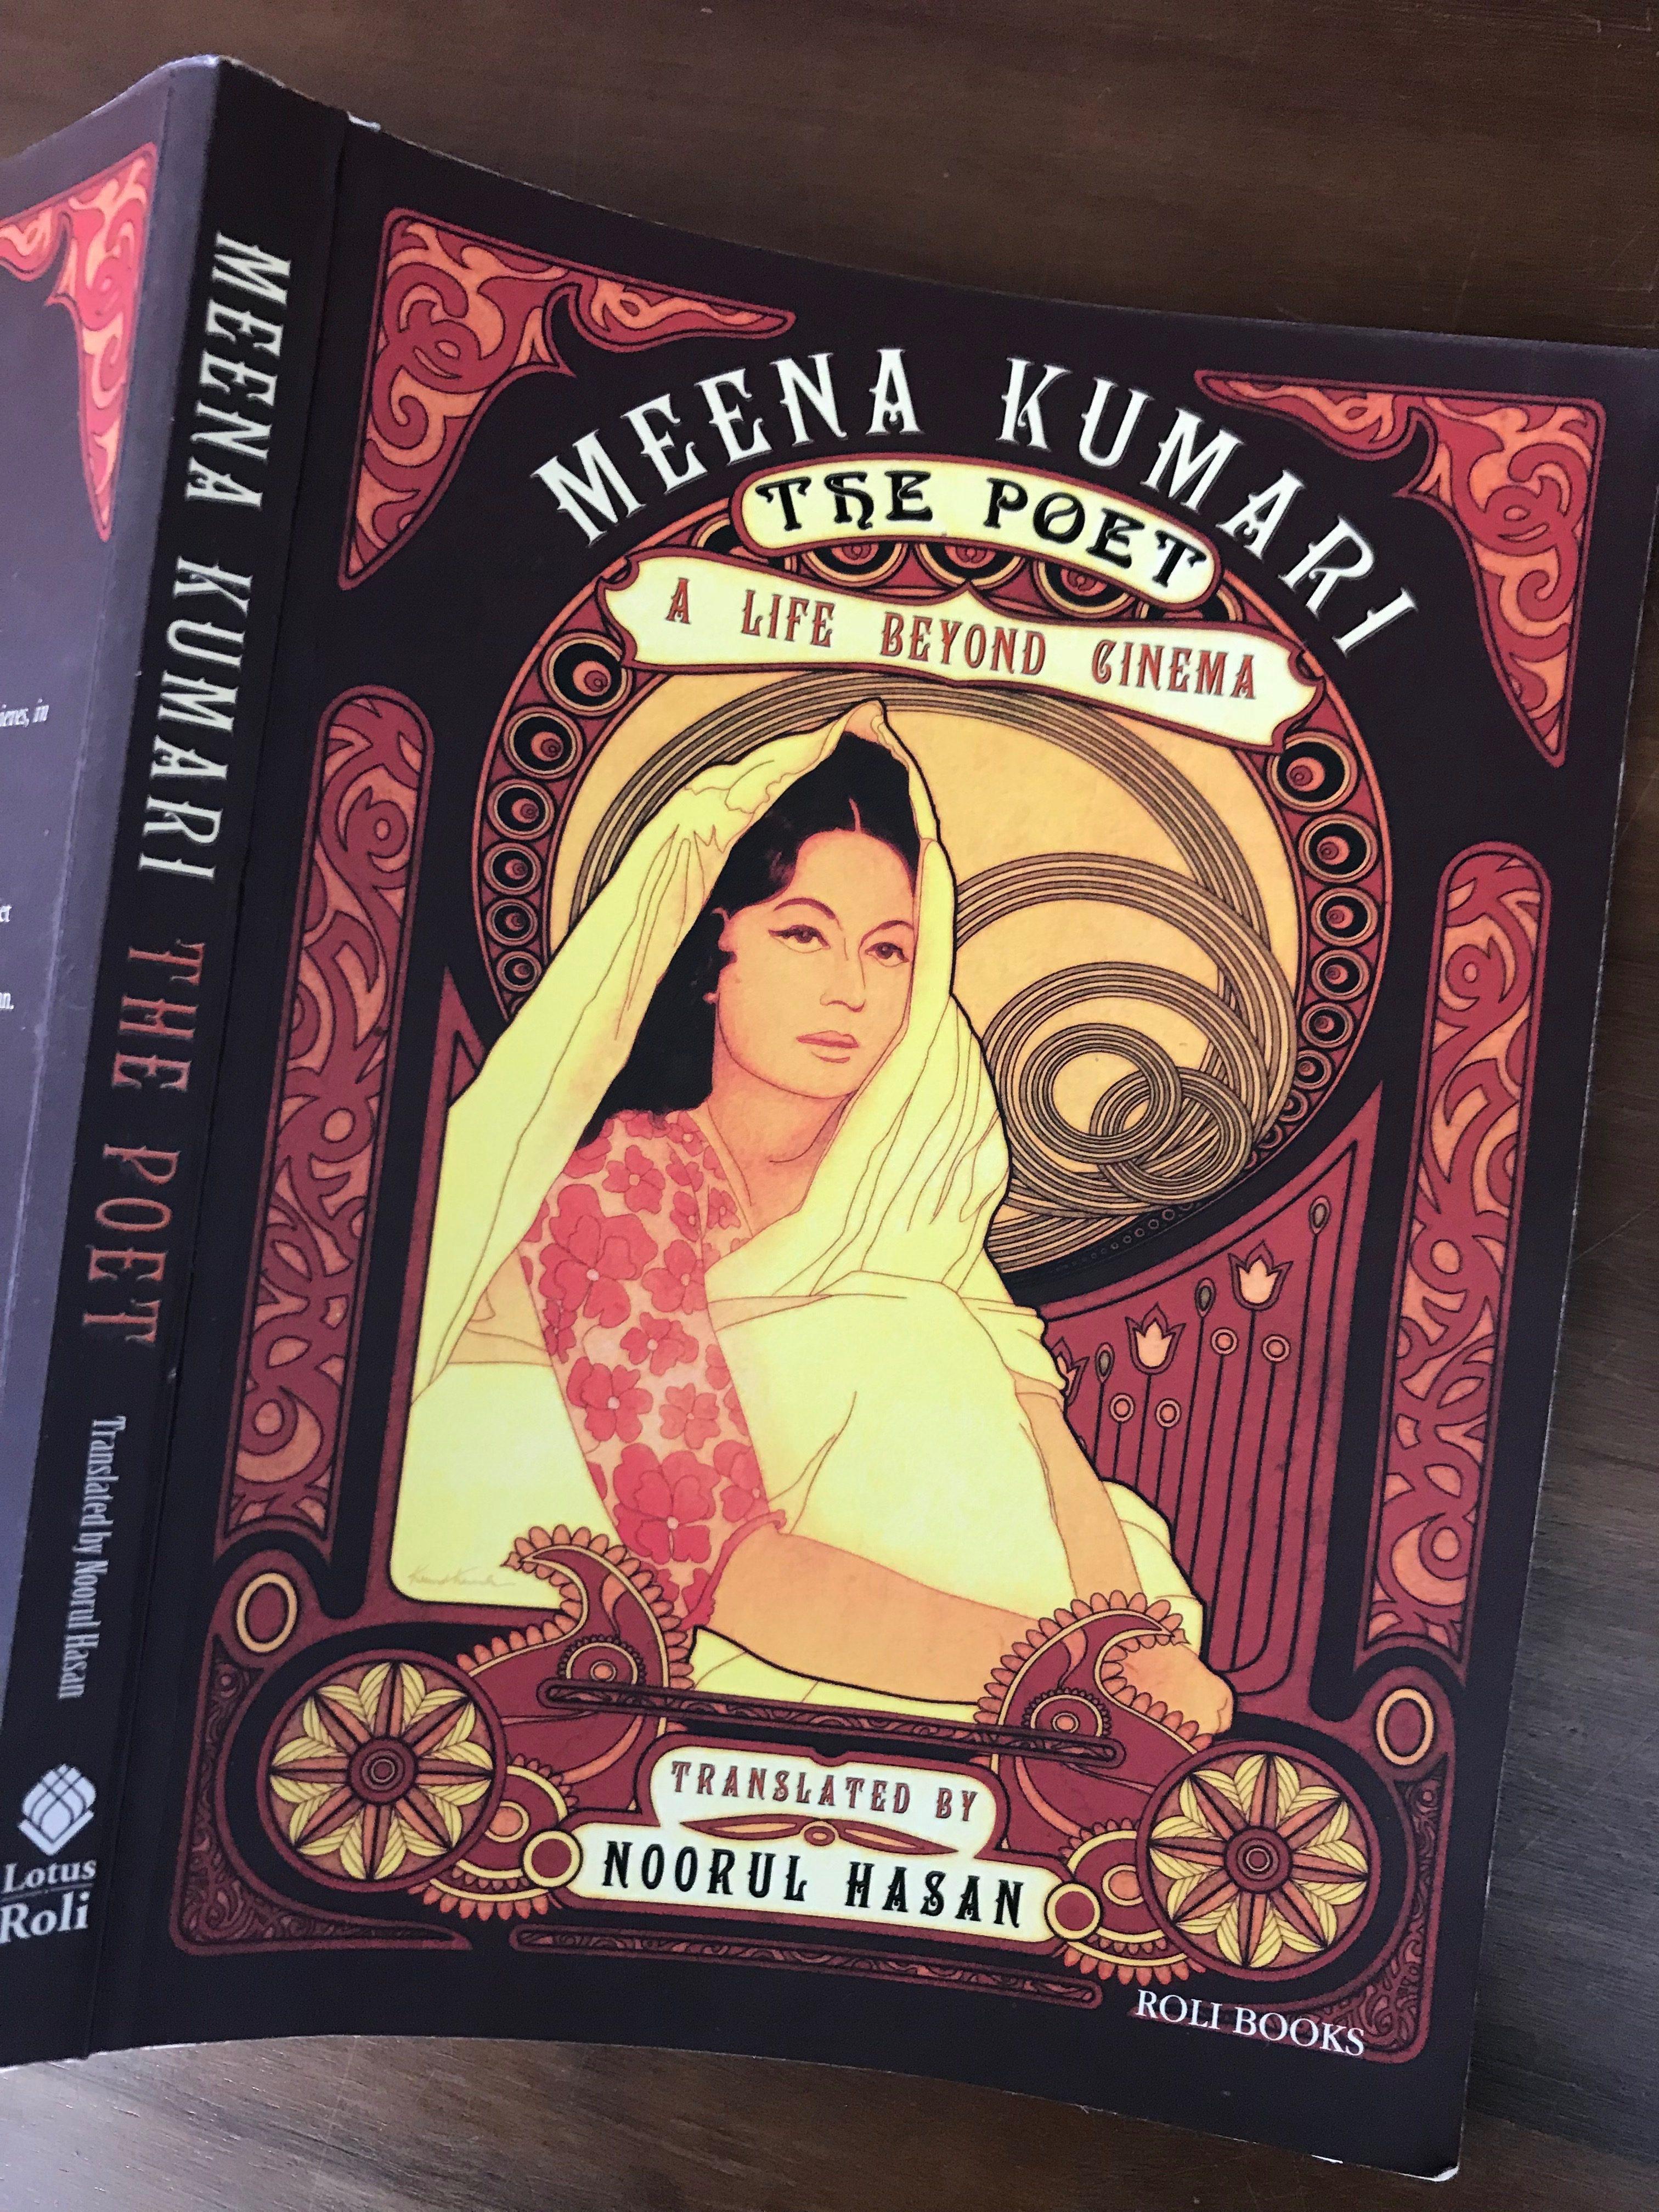 Meena Kumari: The Poet. A Life Beyond Cinema.